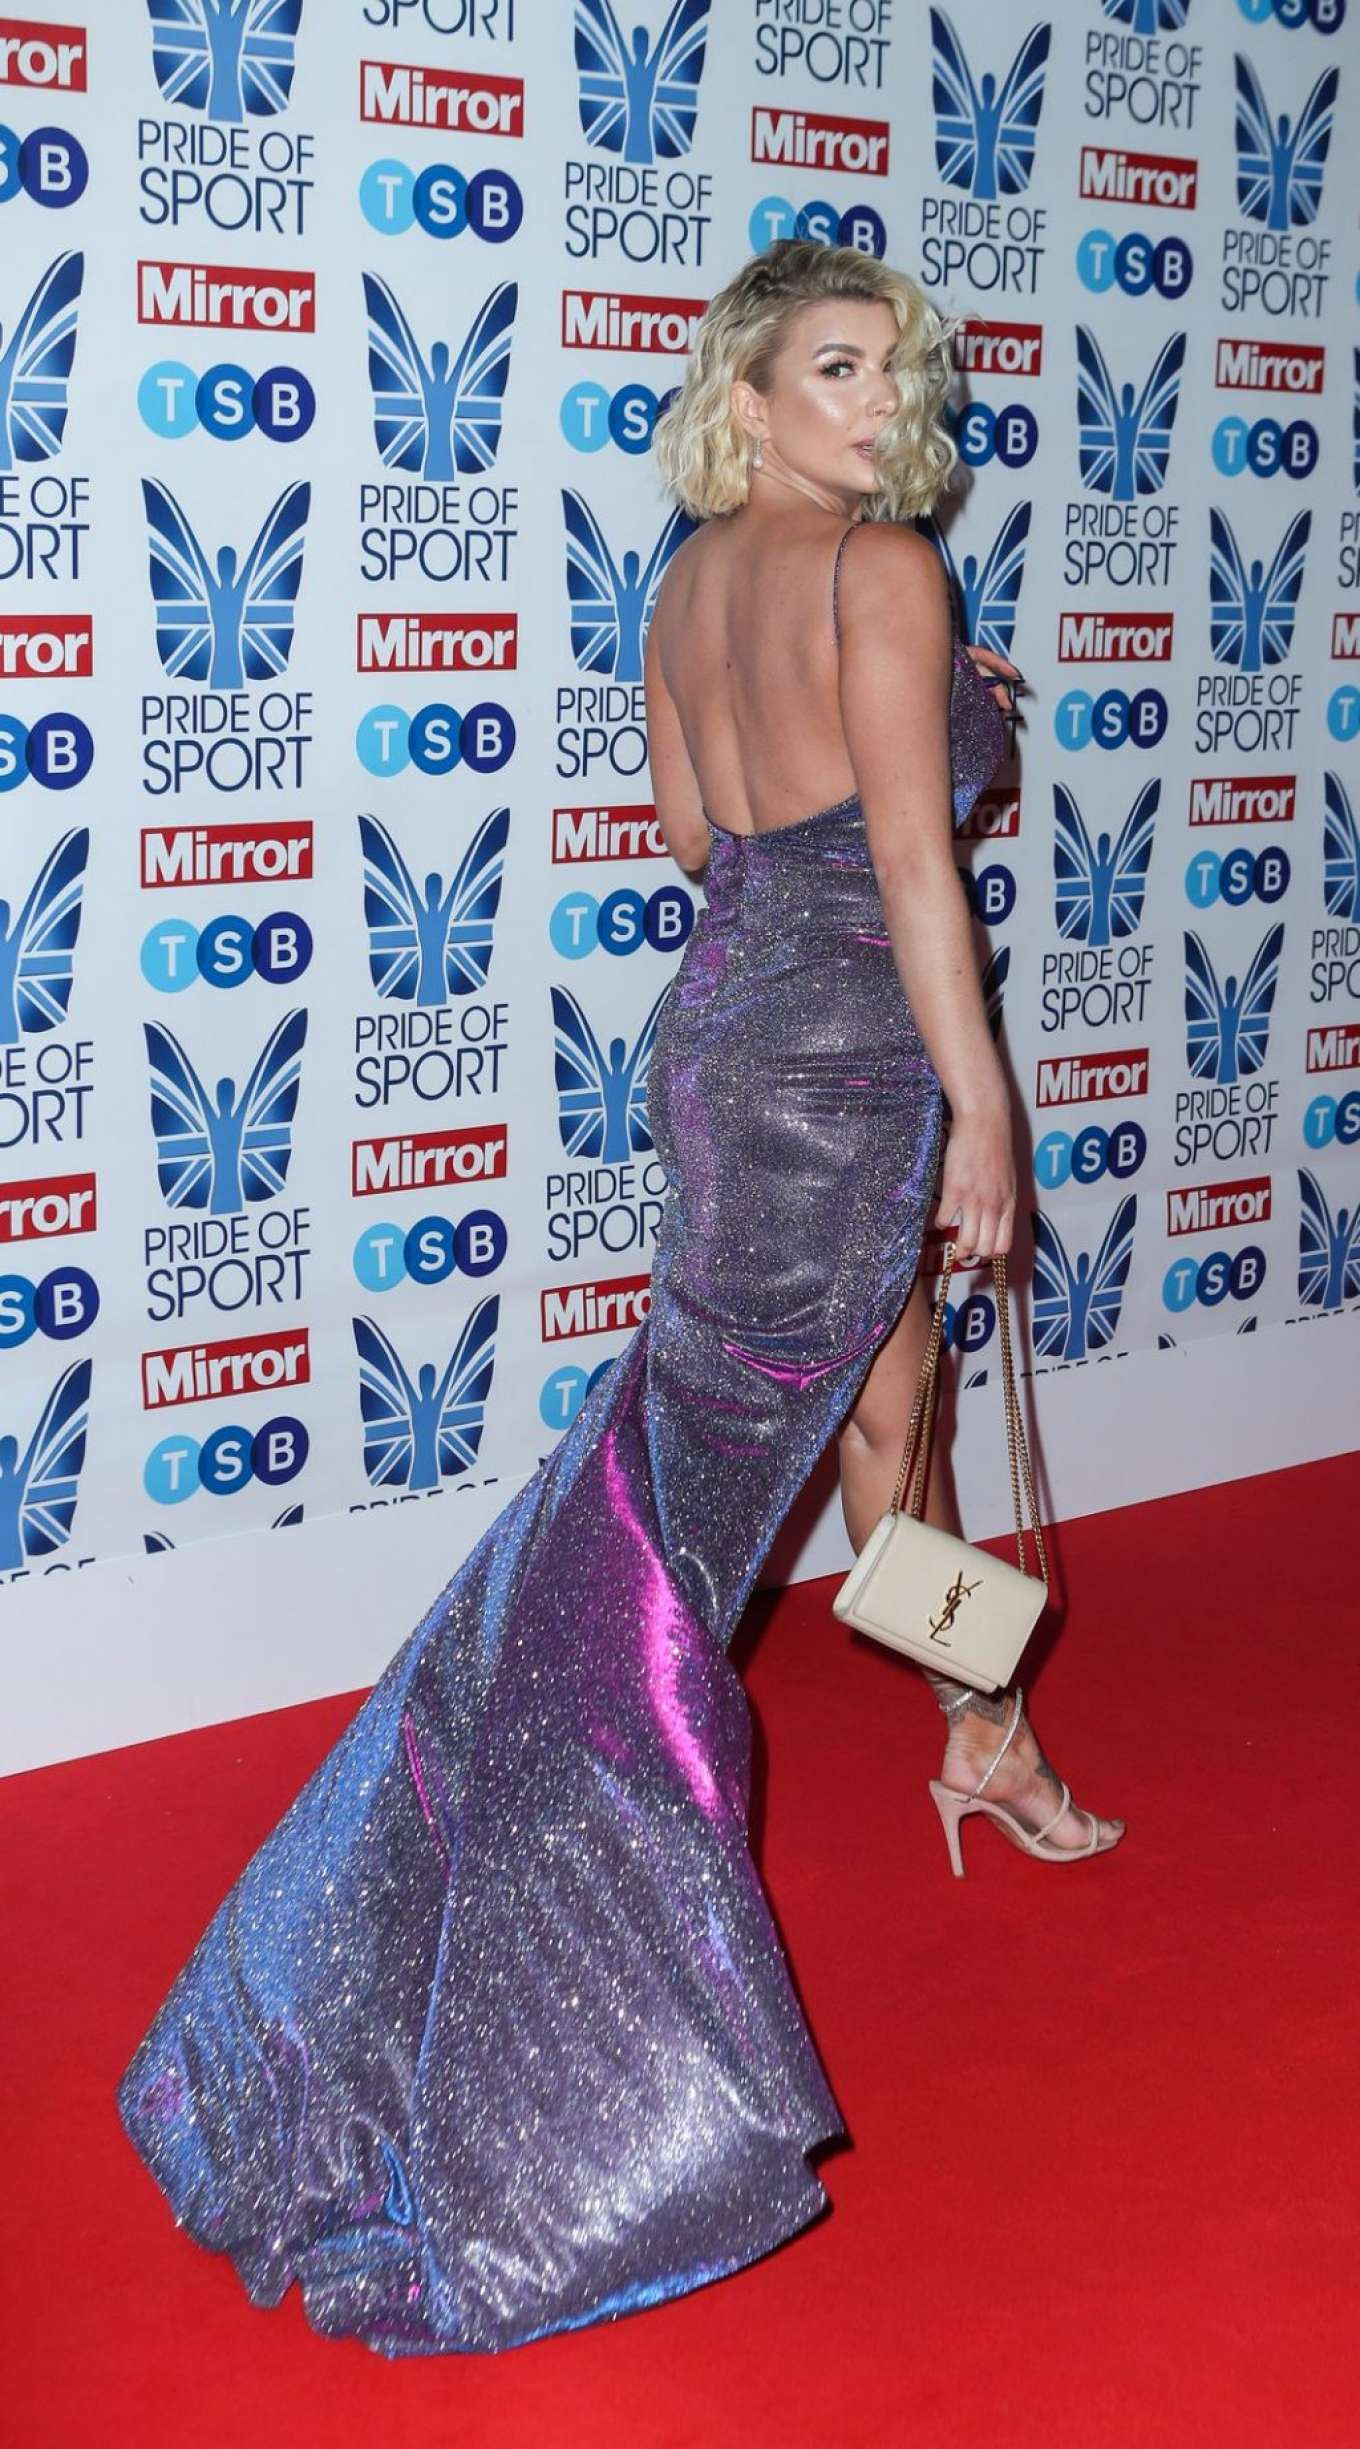 Olivia Buckland 2019 : Olivia Buckland – 2019 Daily Mirror Pride of Sport Awards-15